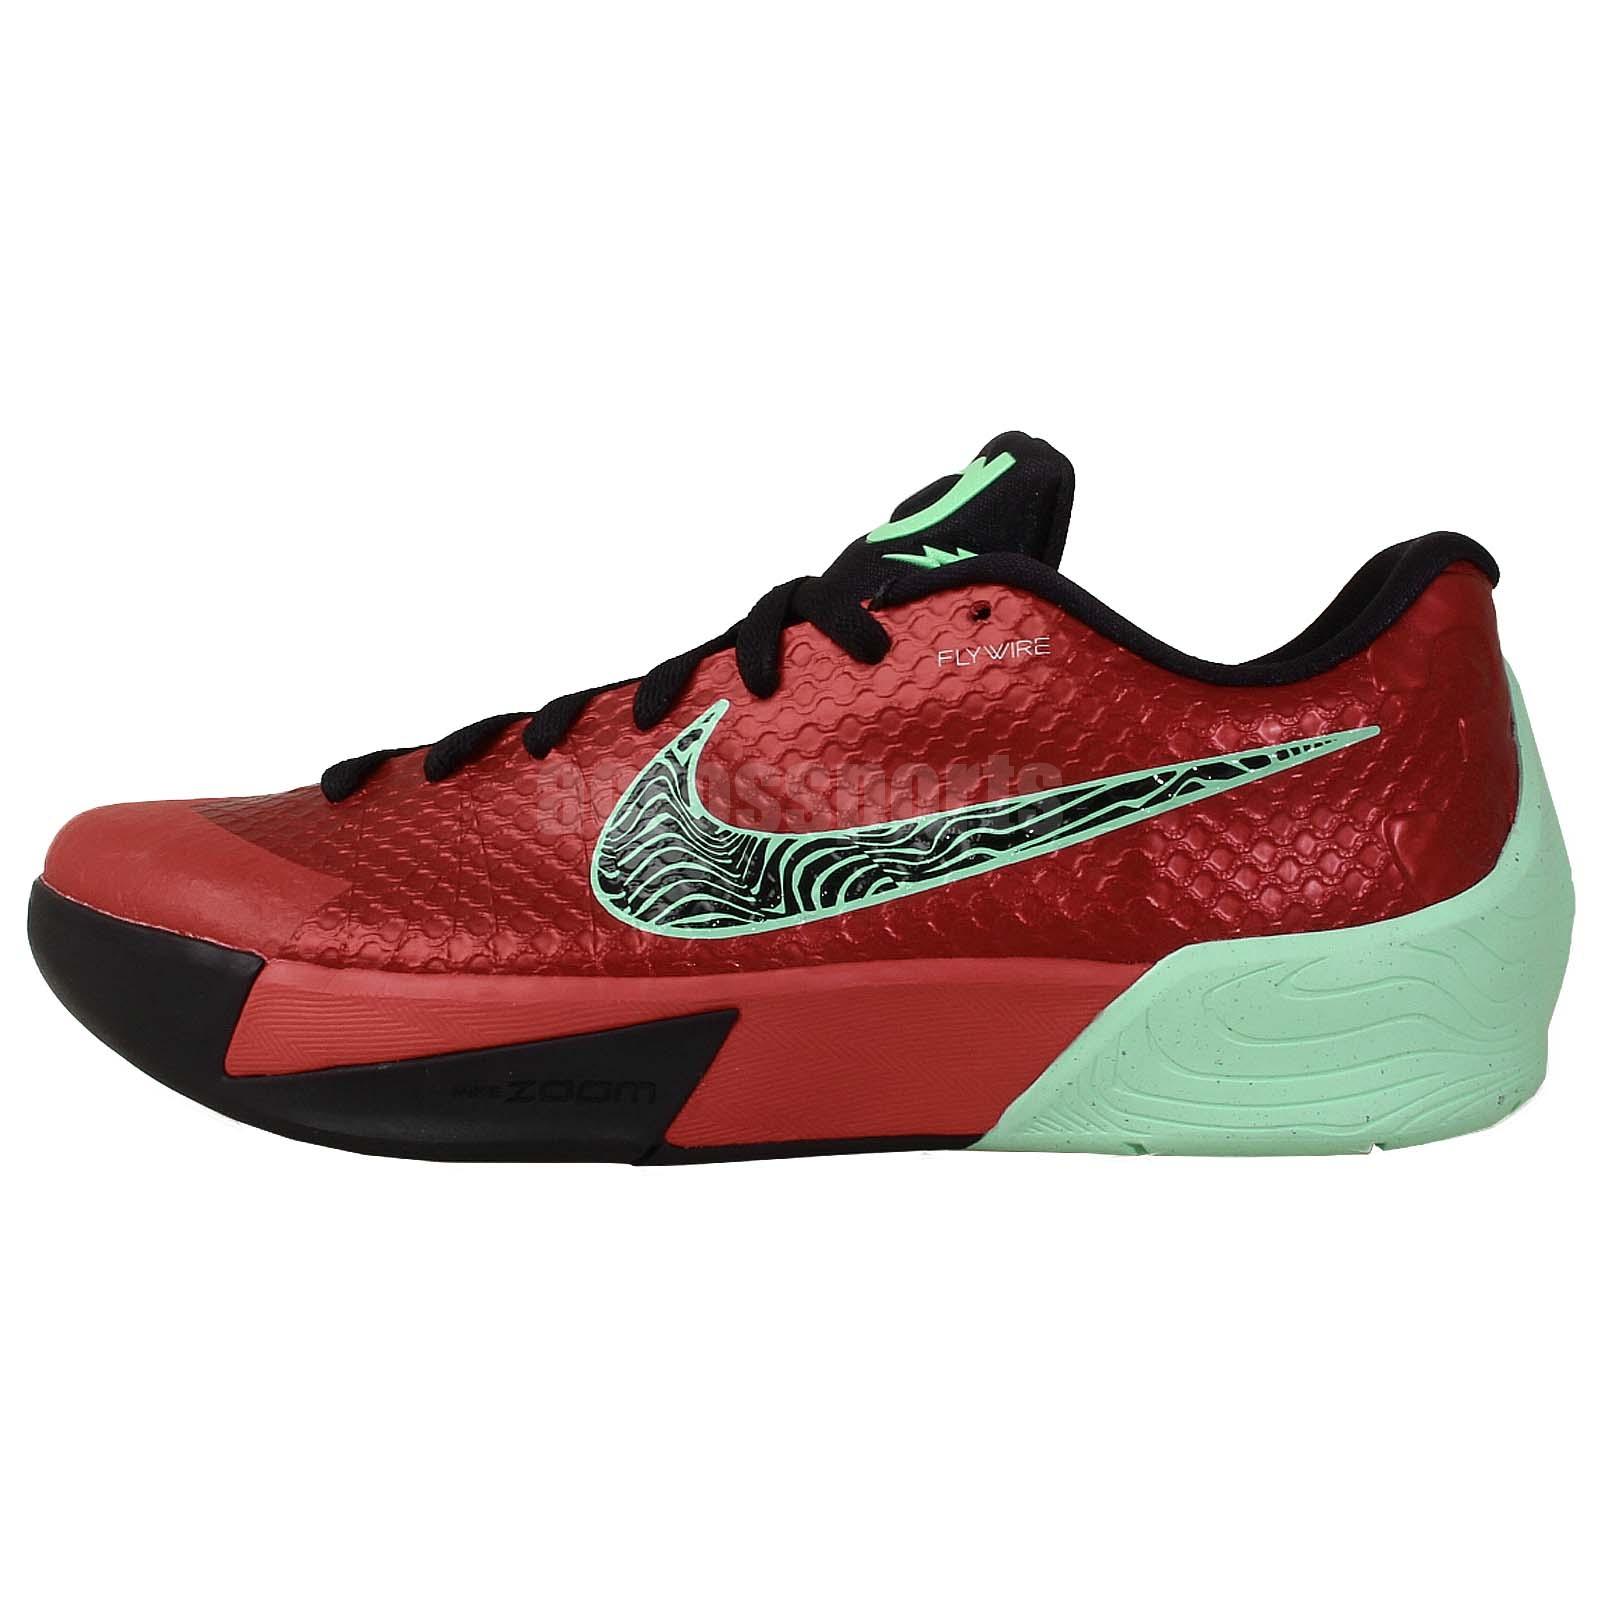 mens nike kd trey 5 ii basketball shoes